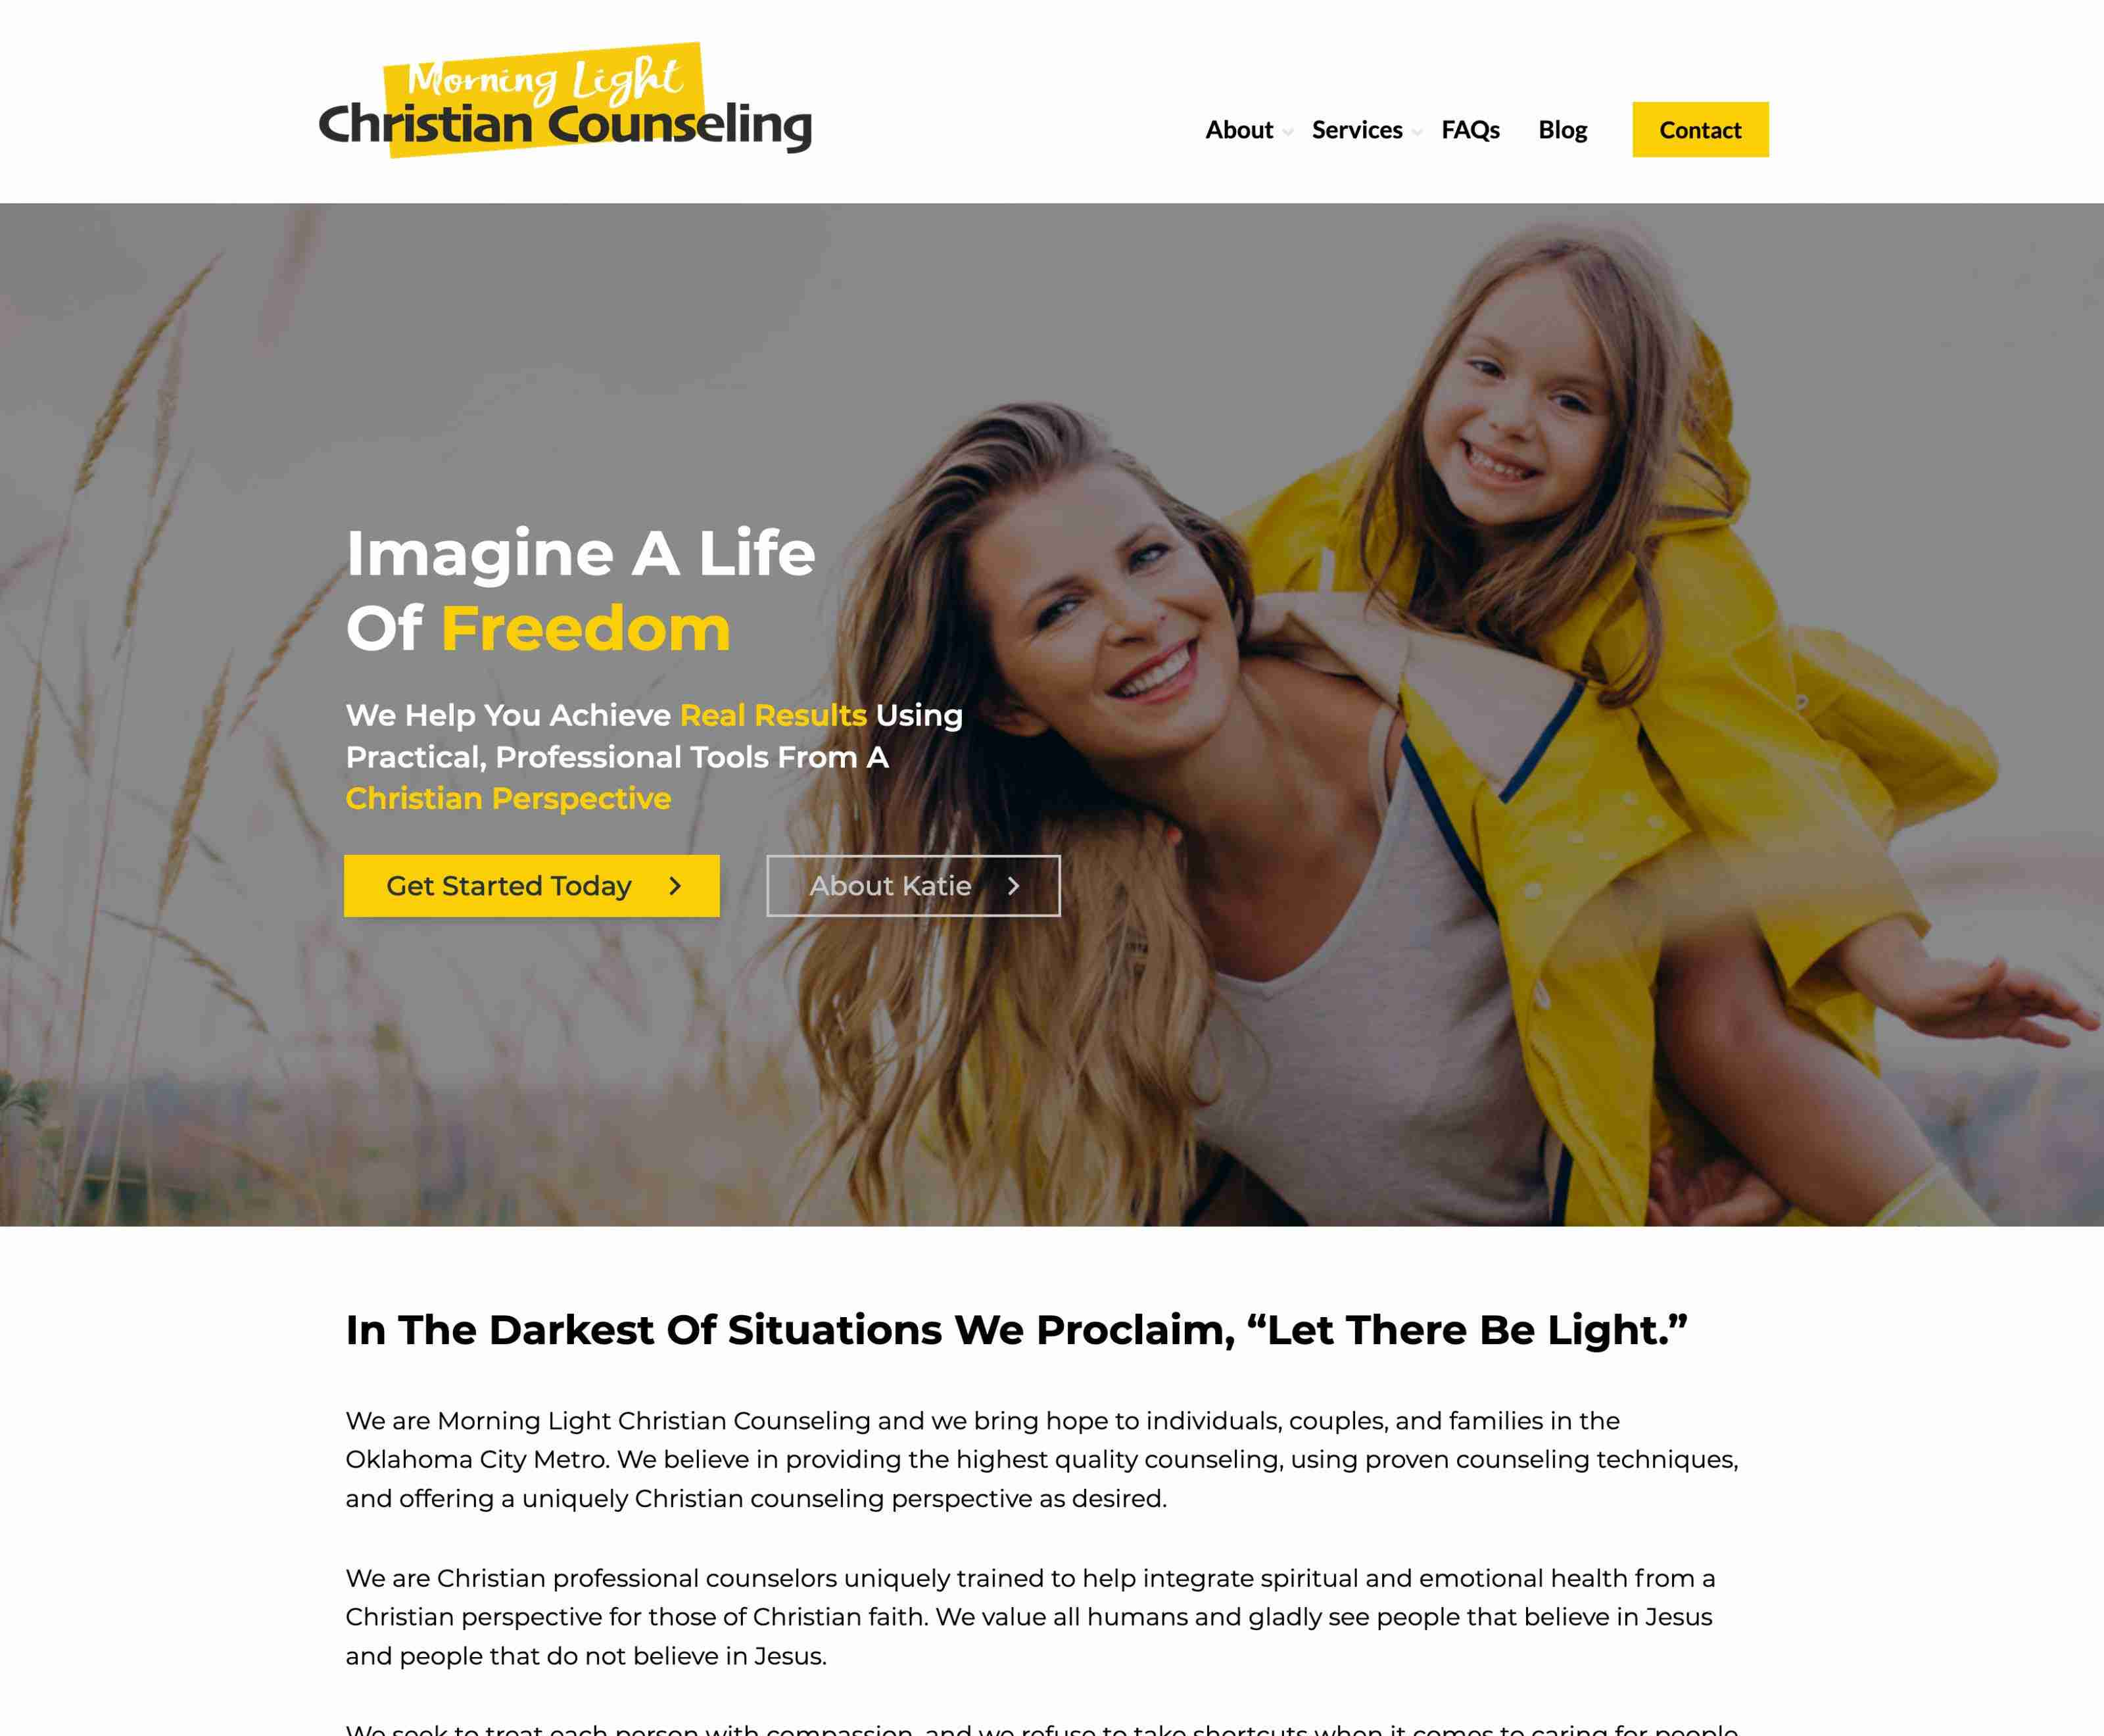 Morning Light Christian Counseling